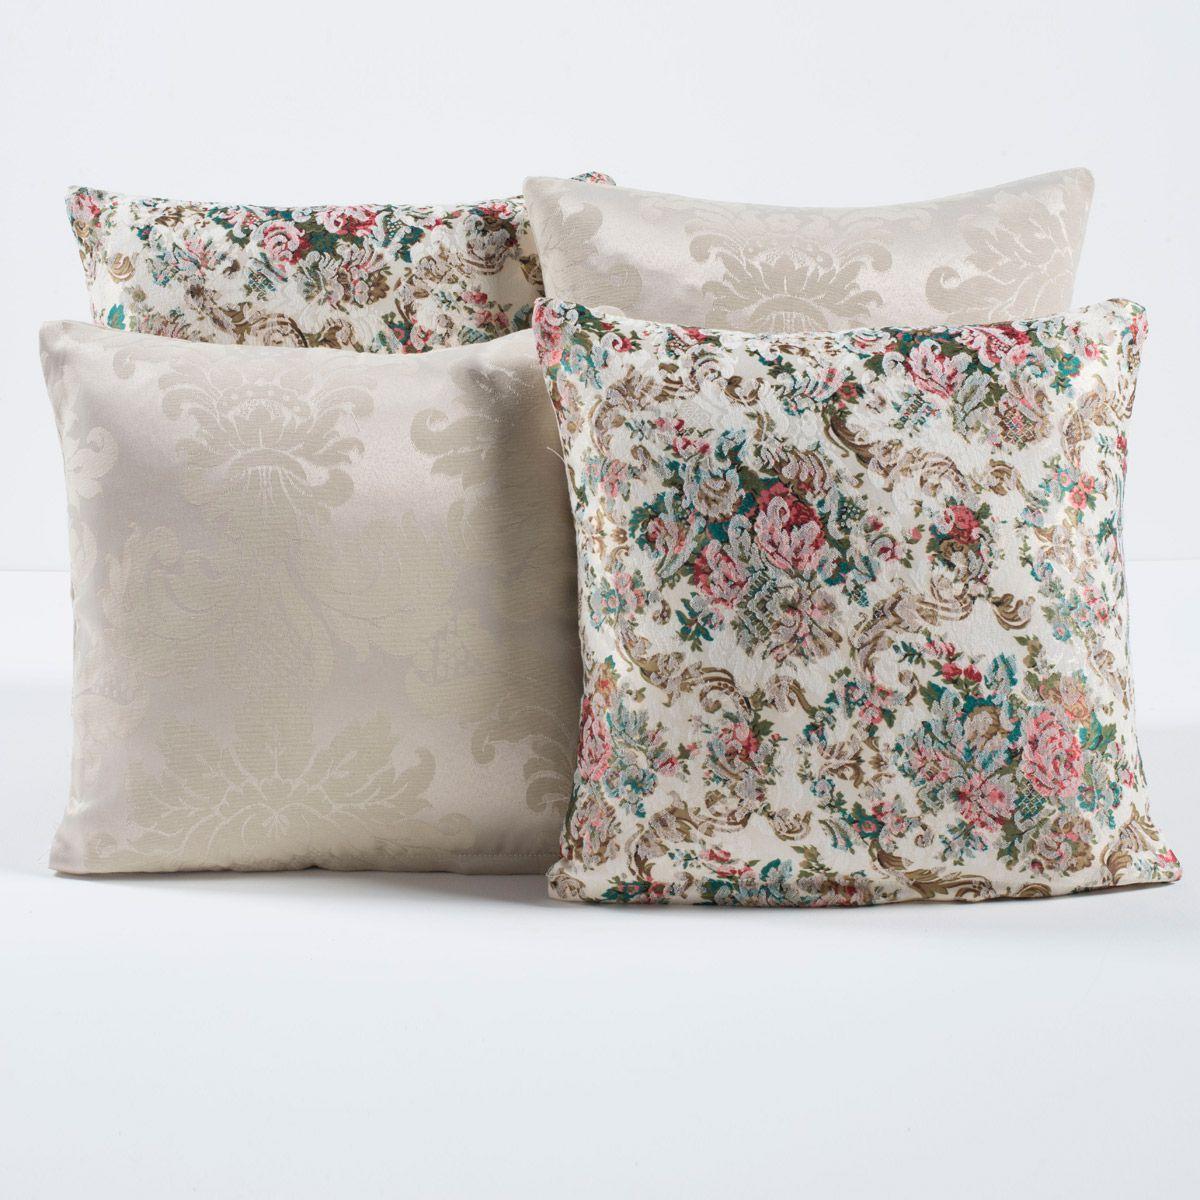 Kit Capas de Almofadas Decorativas Floral Palha/Bege 04 Peças